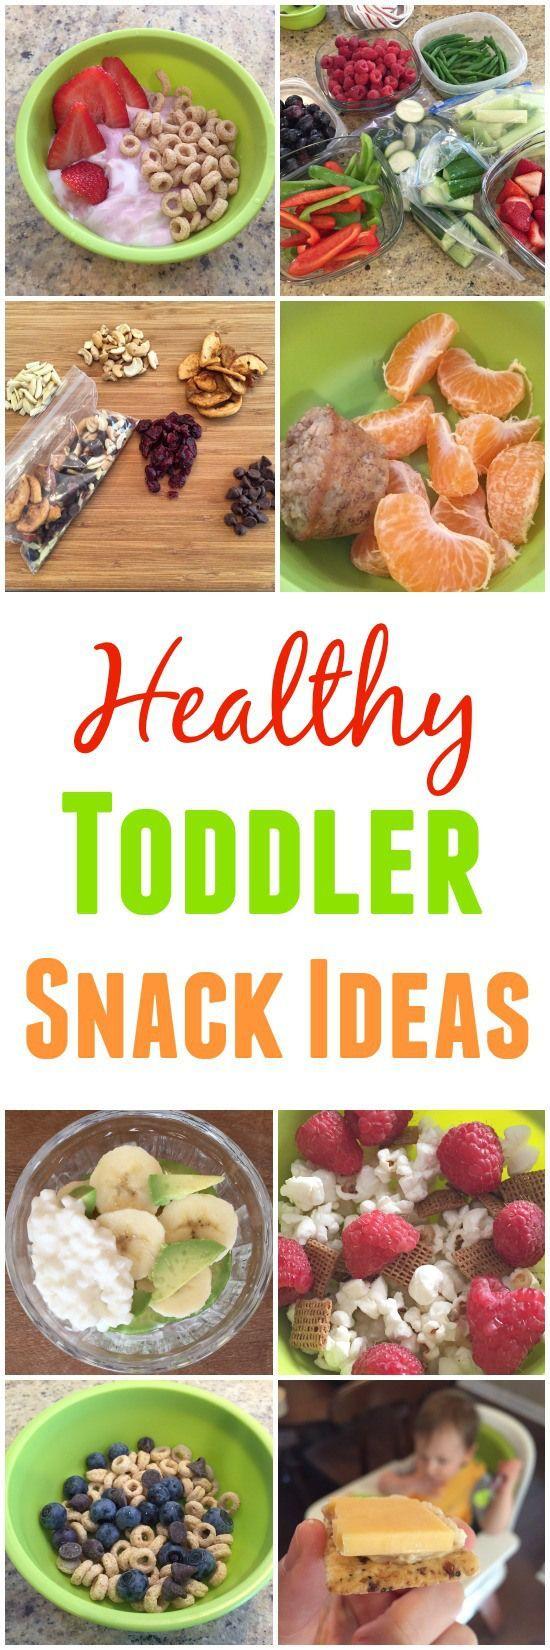 10 Healthy Toddler Snacks